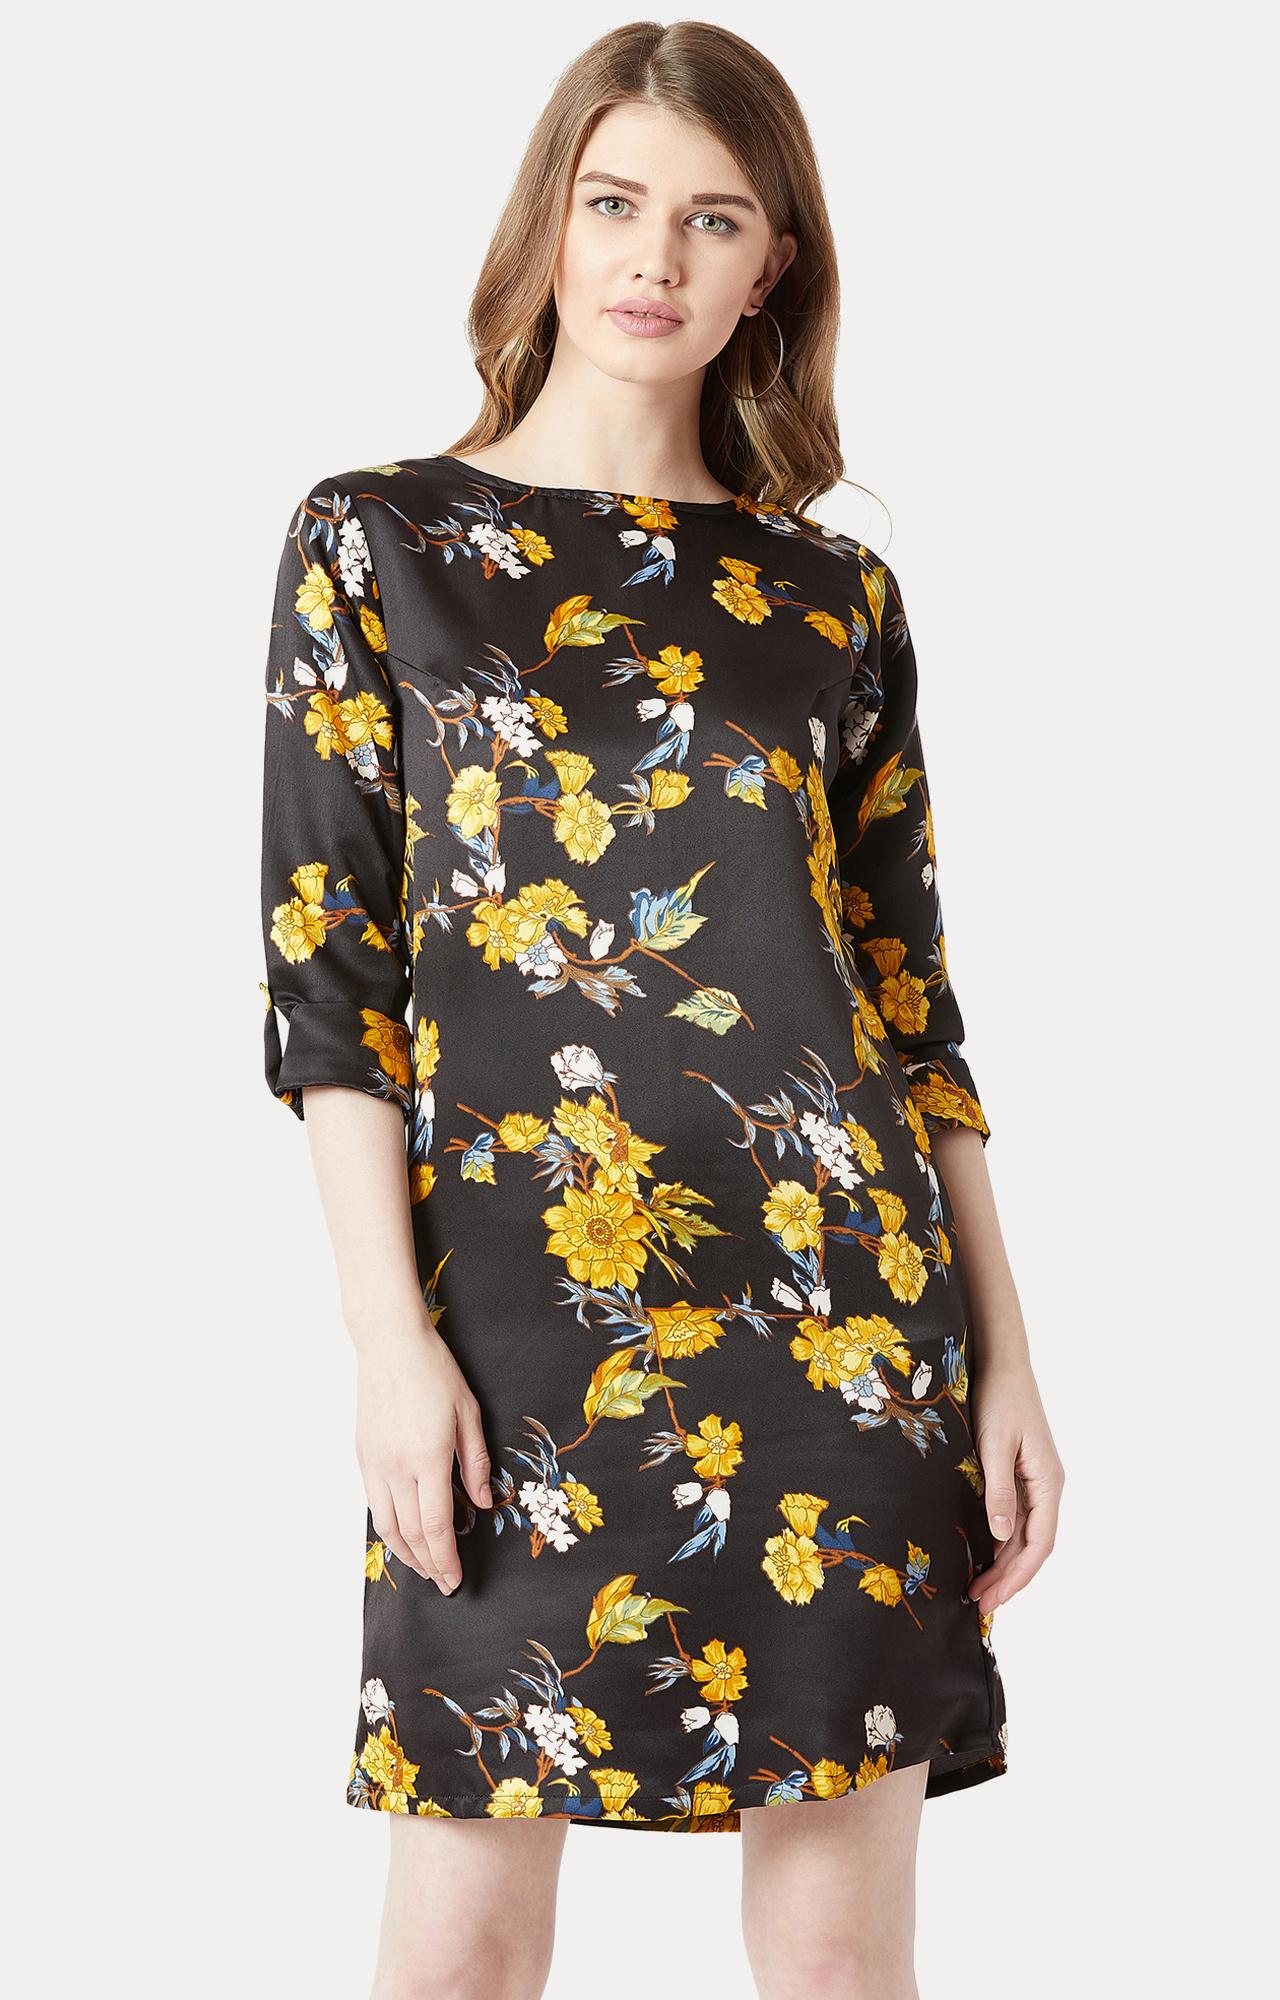 MISS CHASE | Black Floral Shift Dress